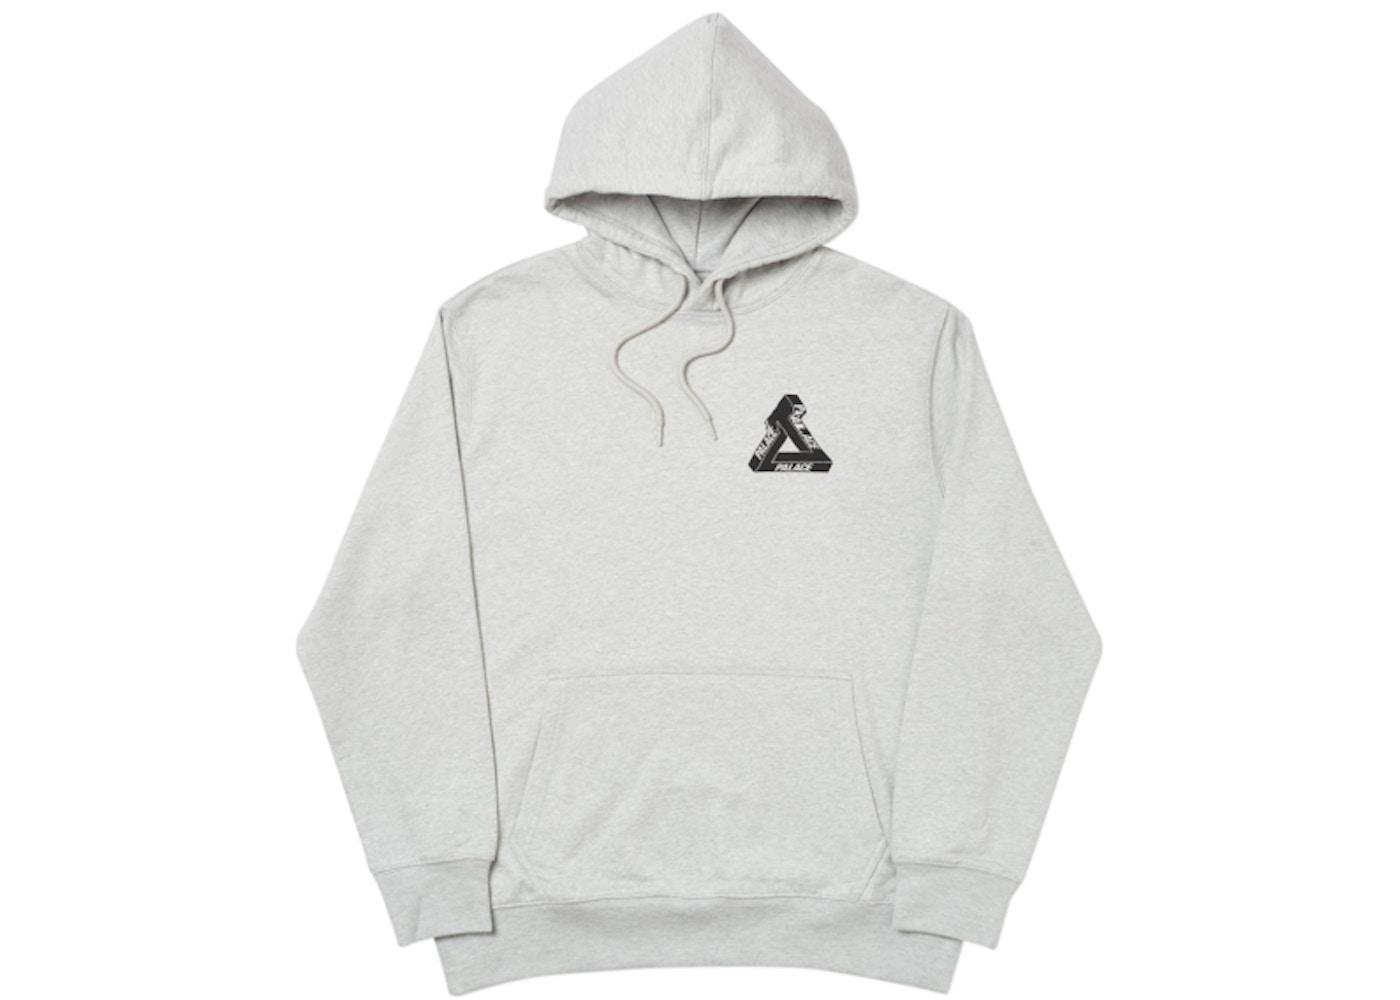 bd5a407ab9a3 Palace Tops Sweatshirts - Buy   Sell Streetwear